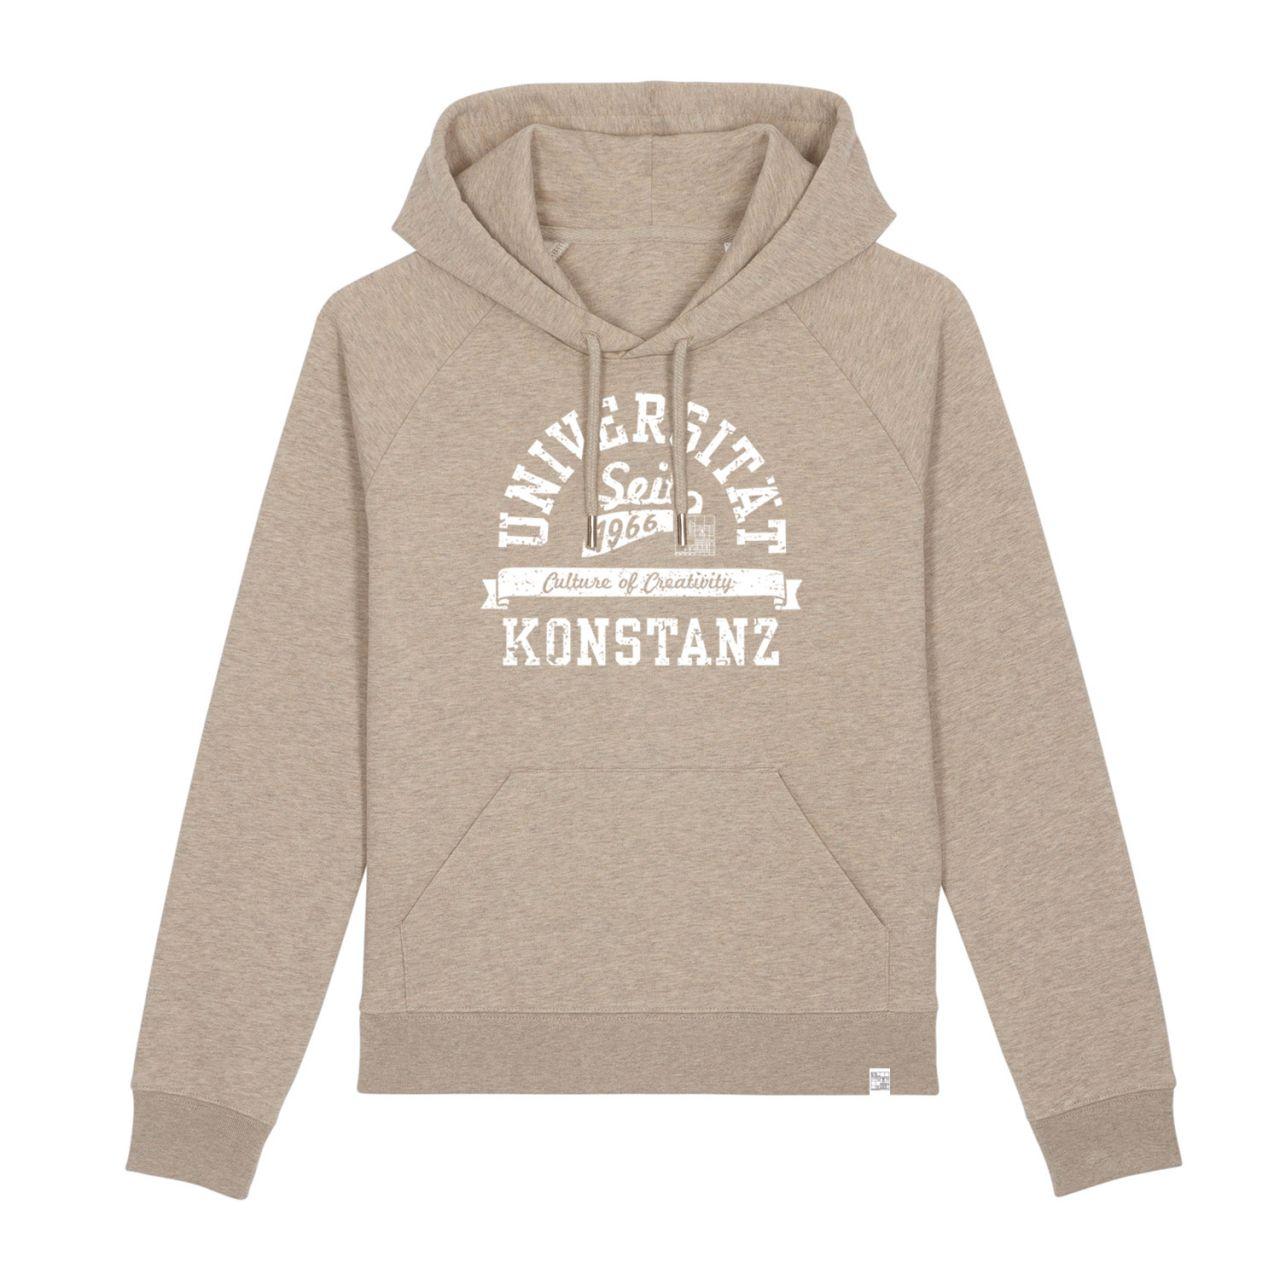 Damen Organic Hooded Sweatshirt, sand, berkley